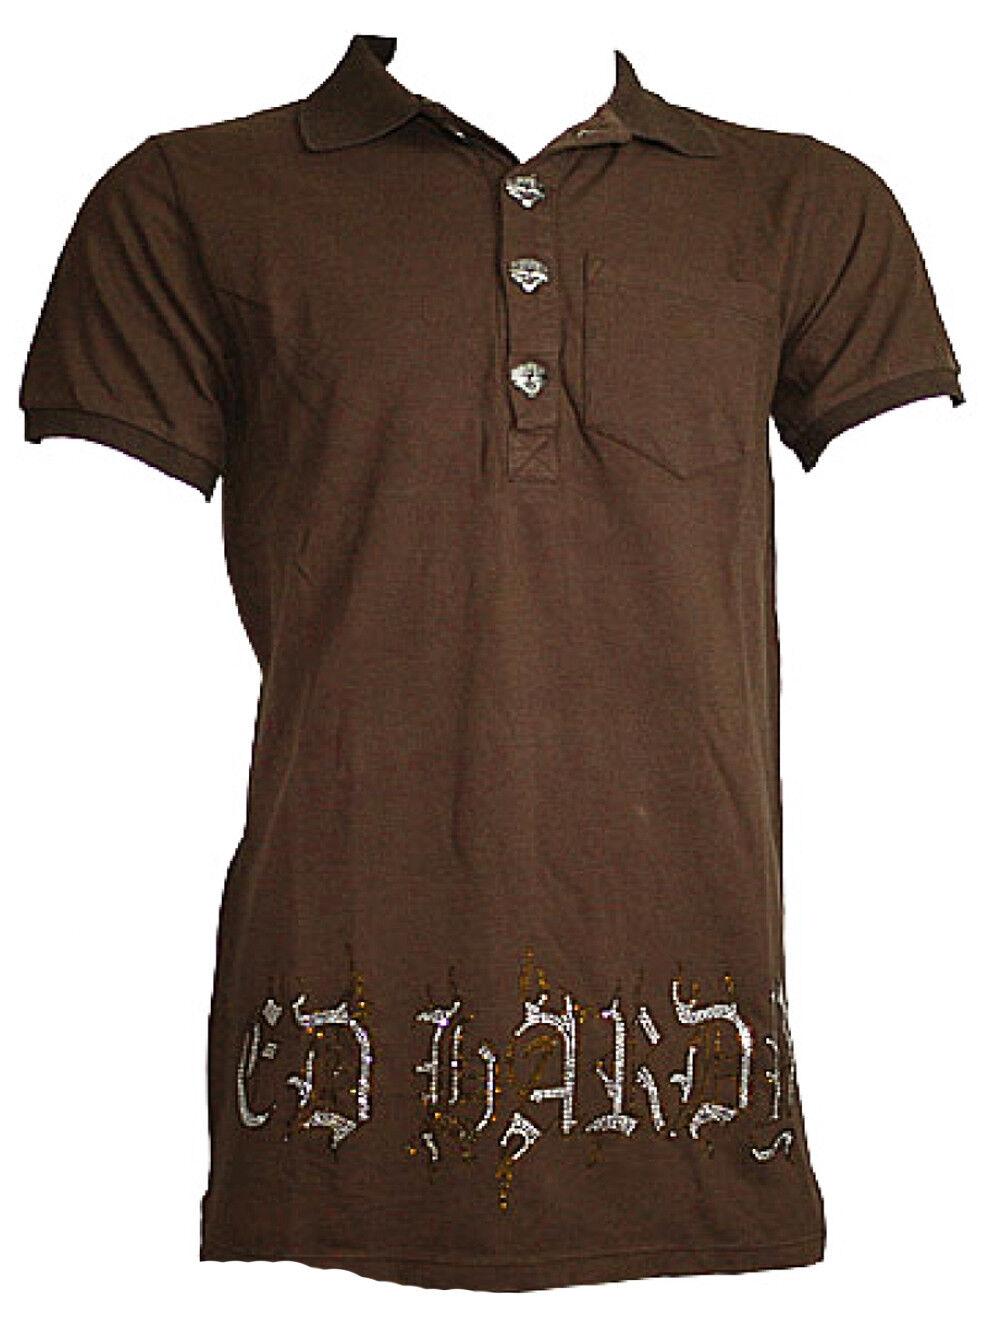 Ed Hardy by Audigier Men Rhinestone Polo Shirt   skullpink   Brown NEW